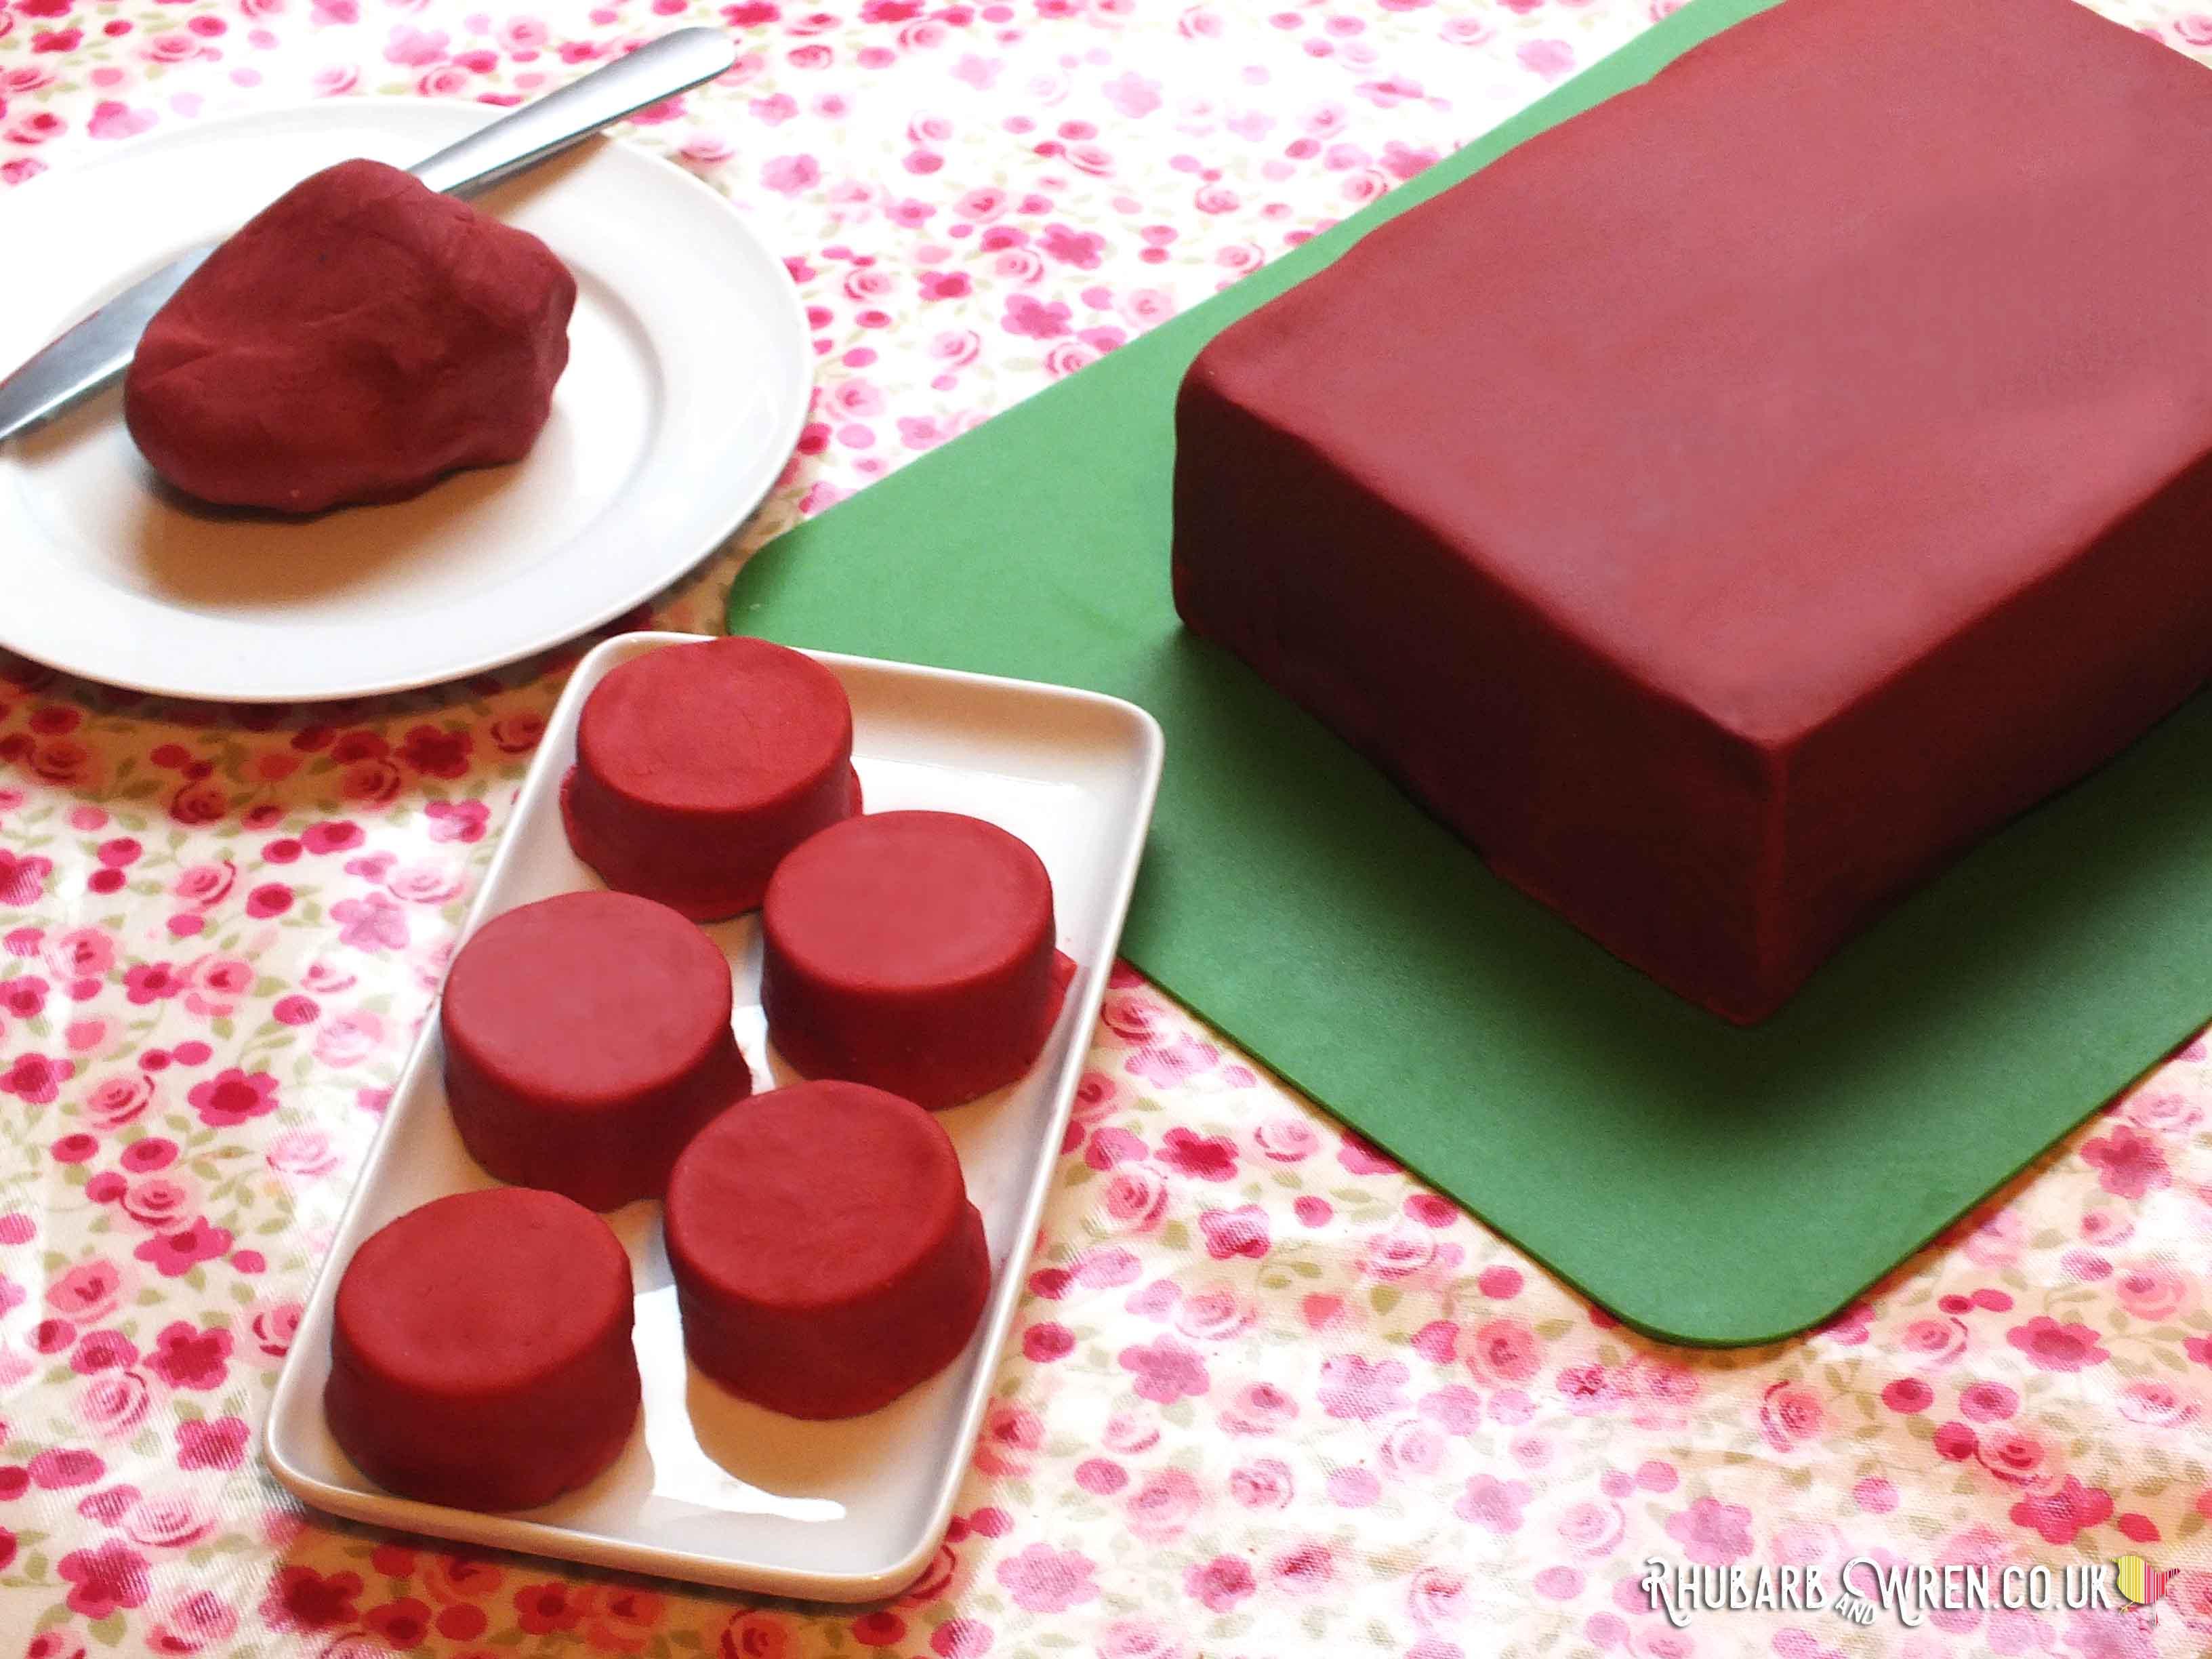 Mini round cakes and large rectangular cake